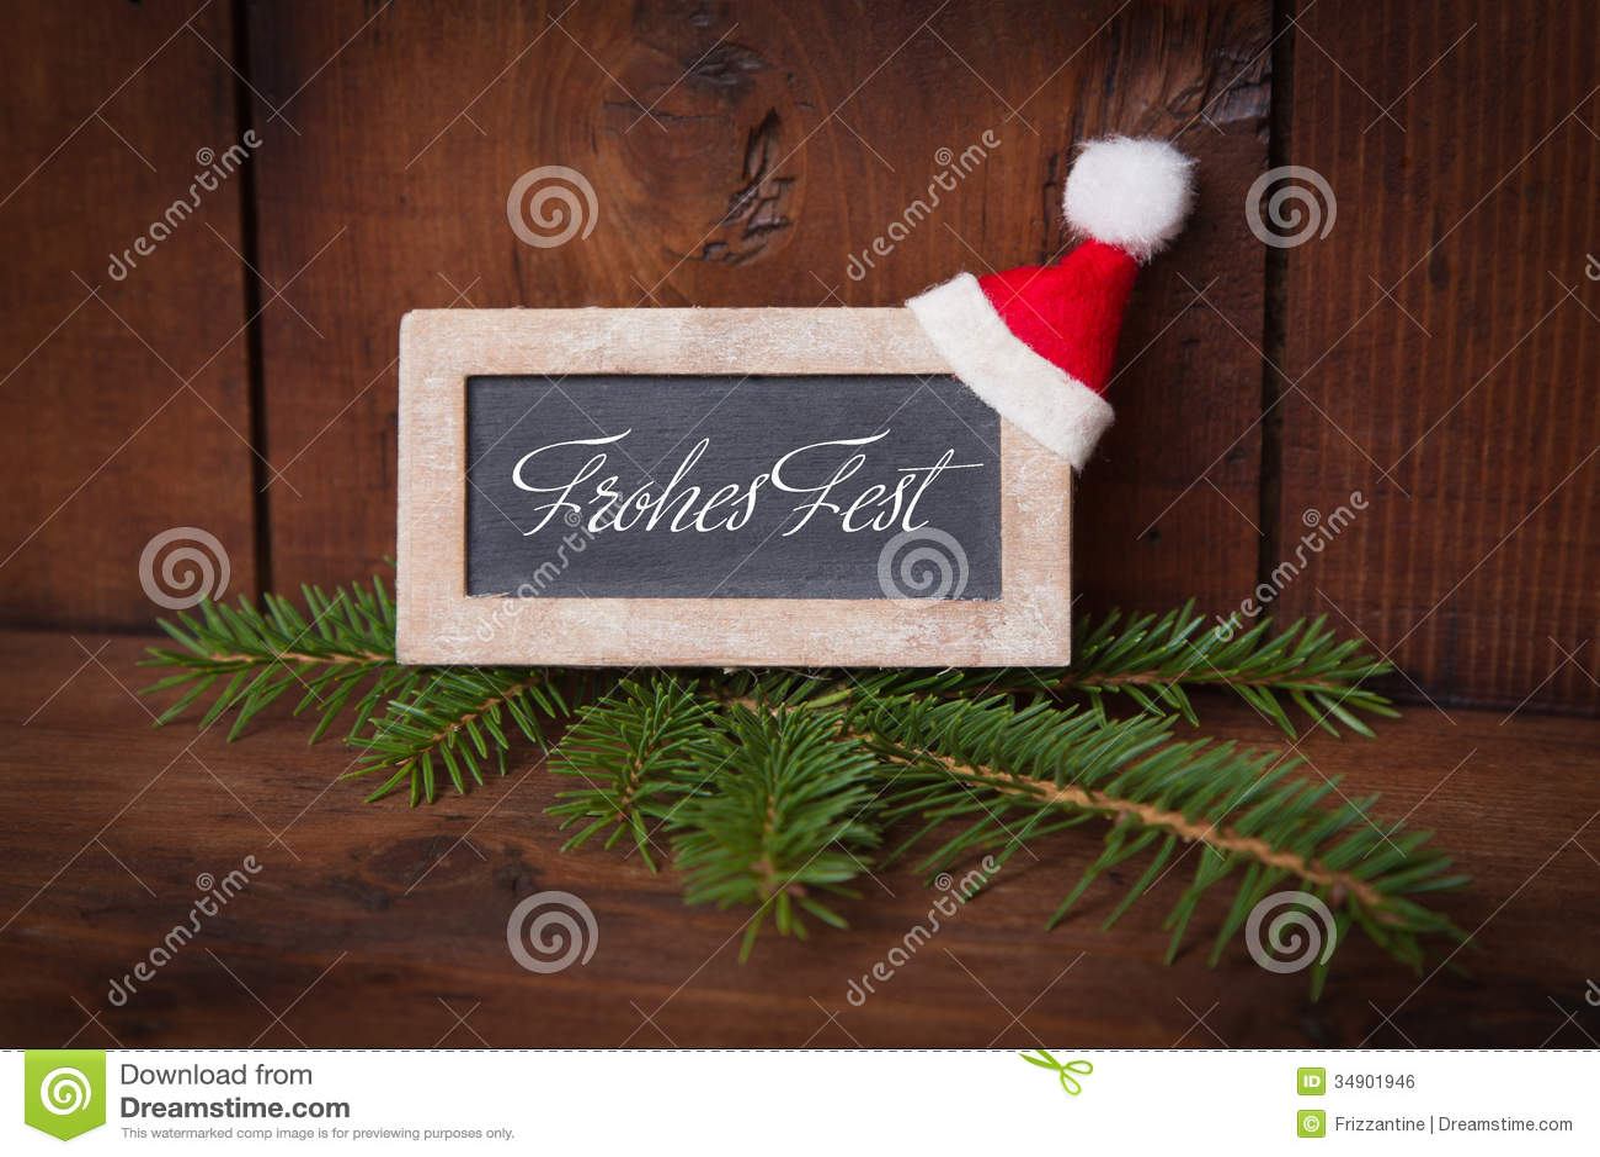 Greeting Happy Holiday On Chalkboard With Santa Hat In German La